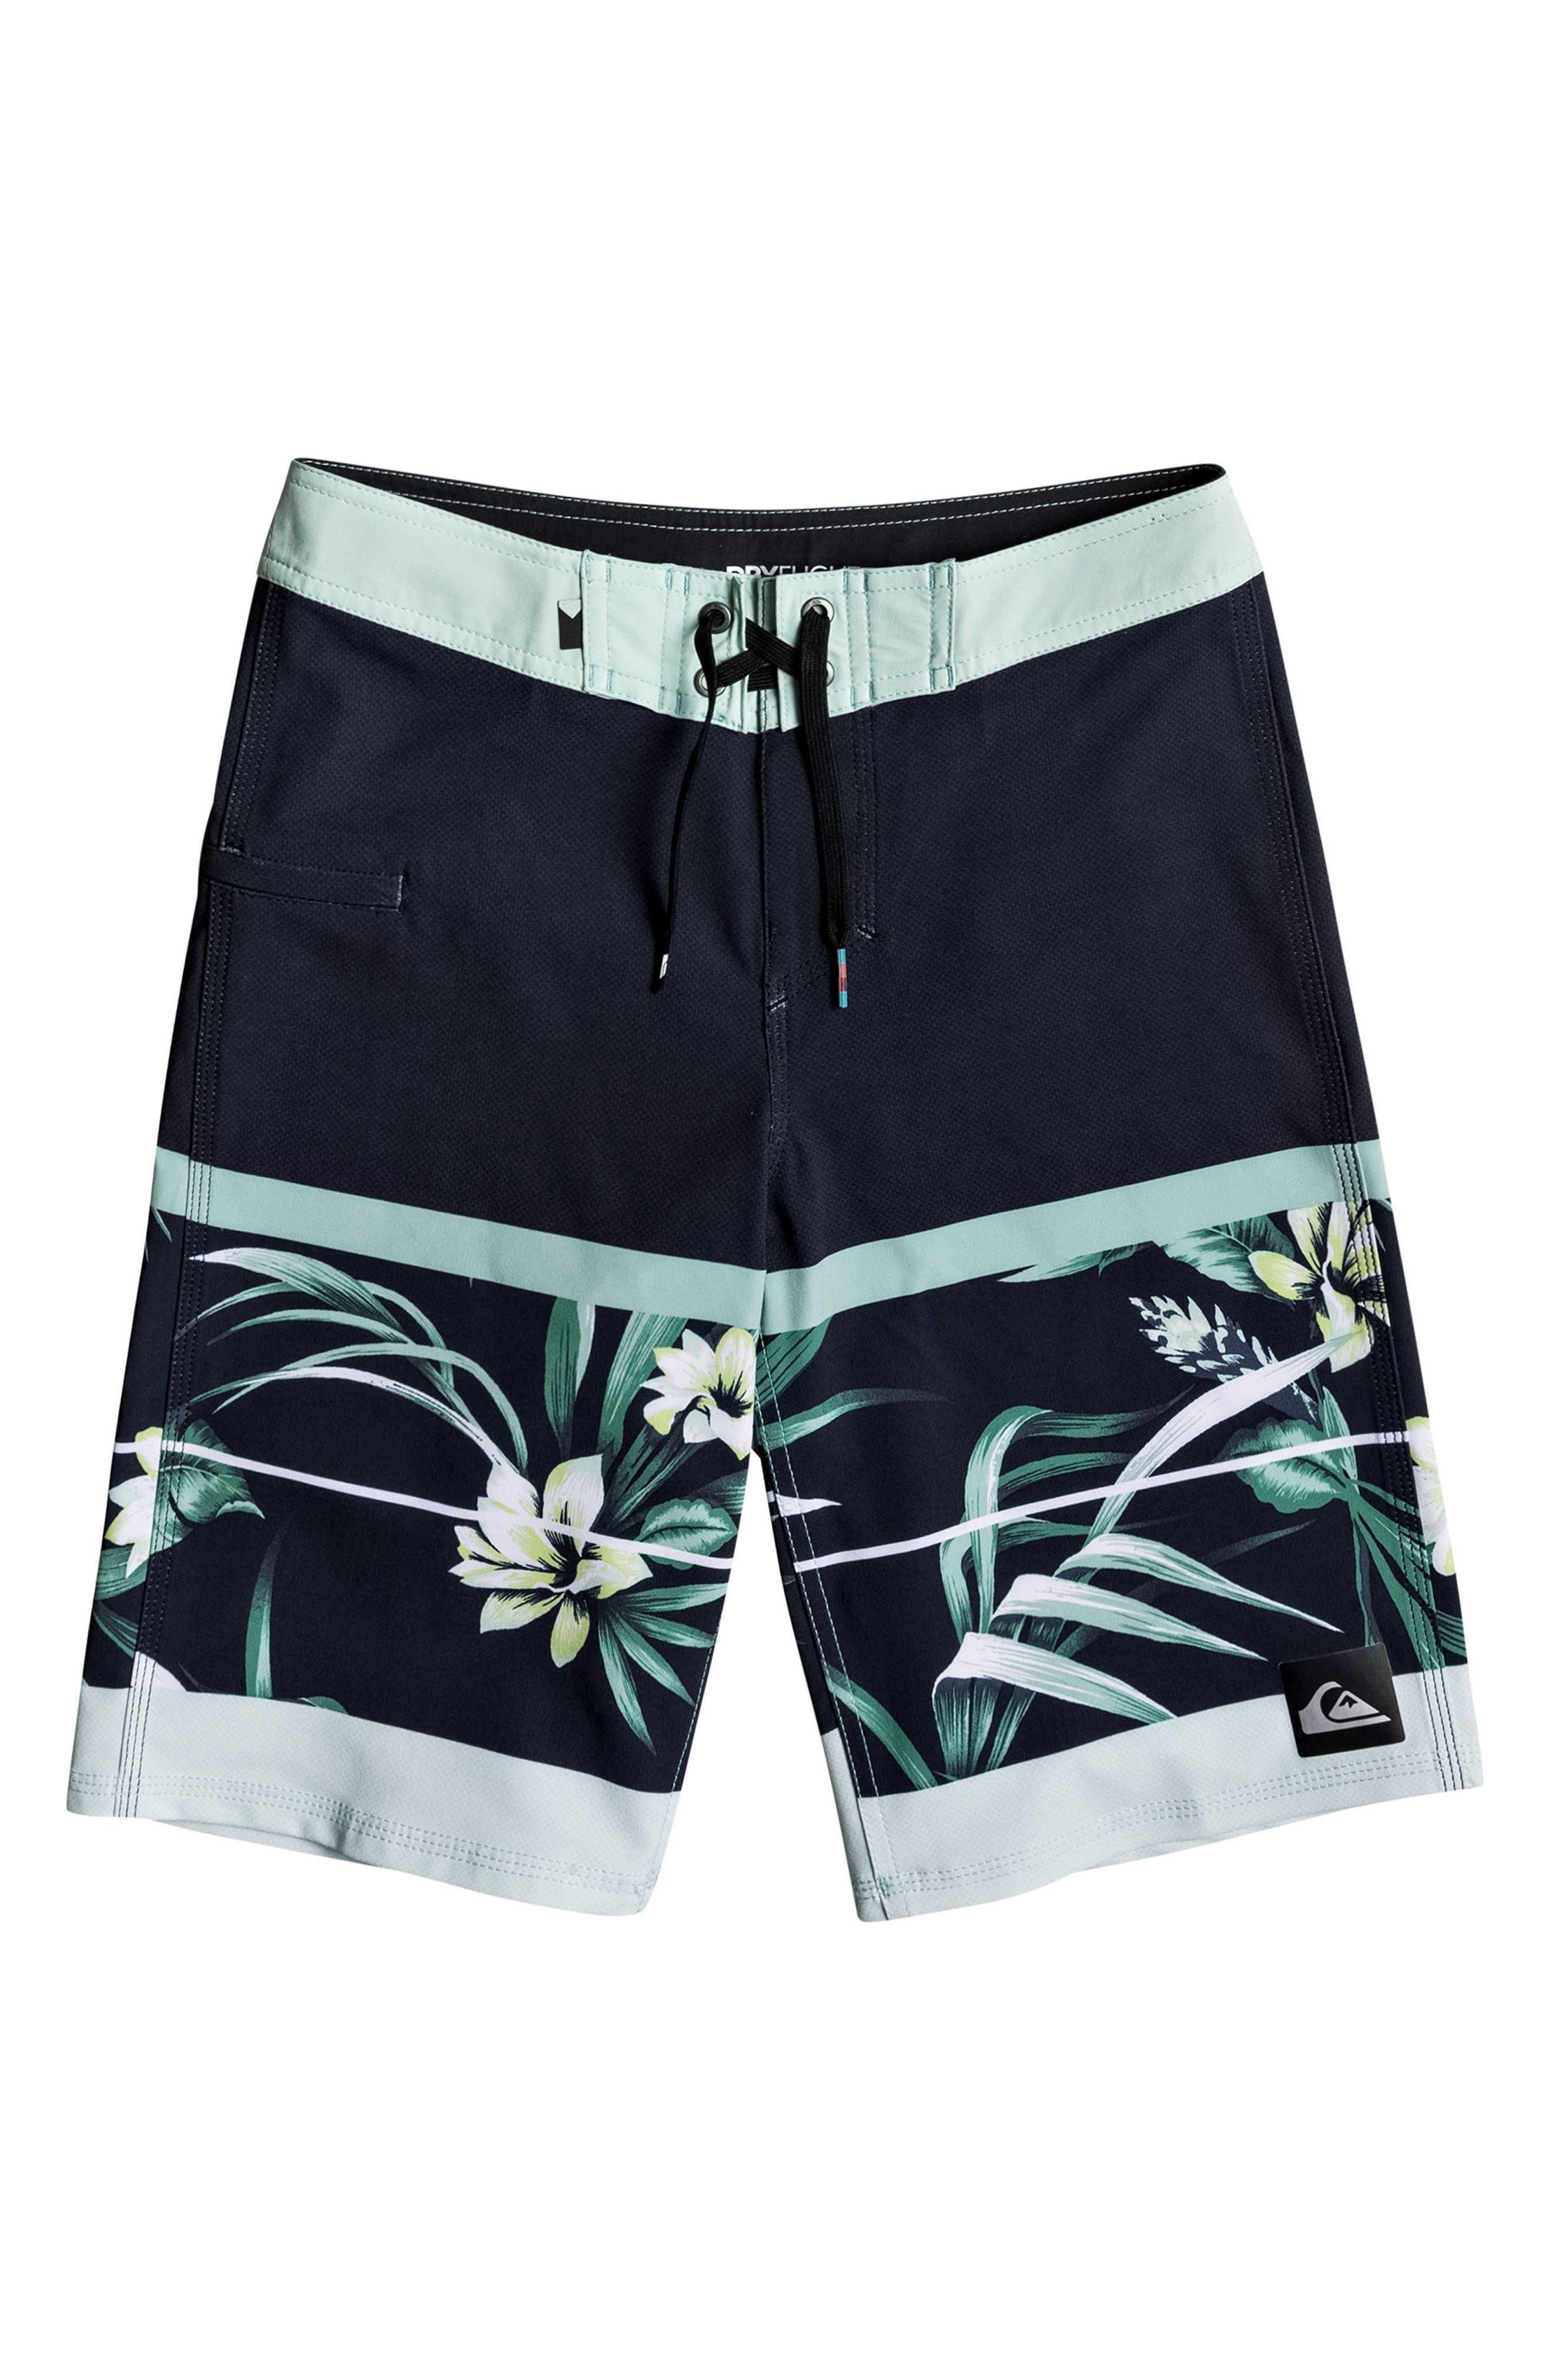 Main Image - Quiksilver Slab Island Vee Board Shorts (Big Boys)